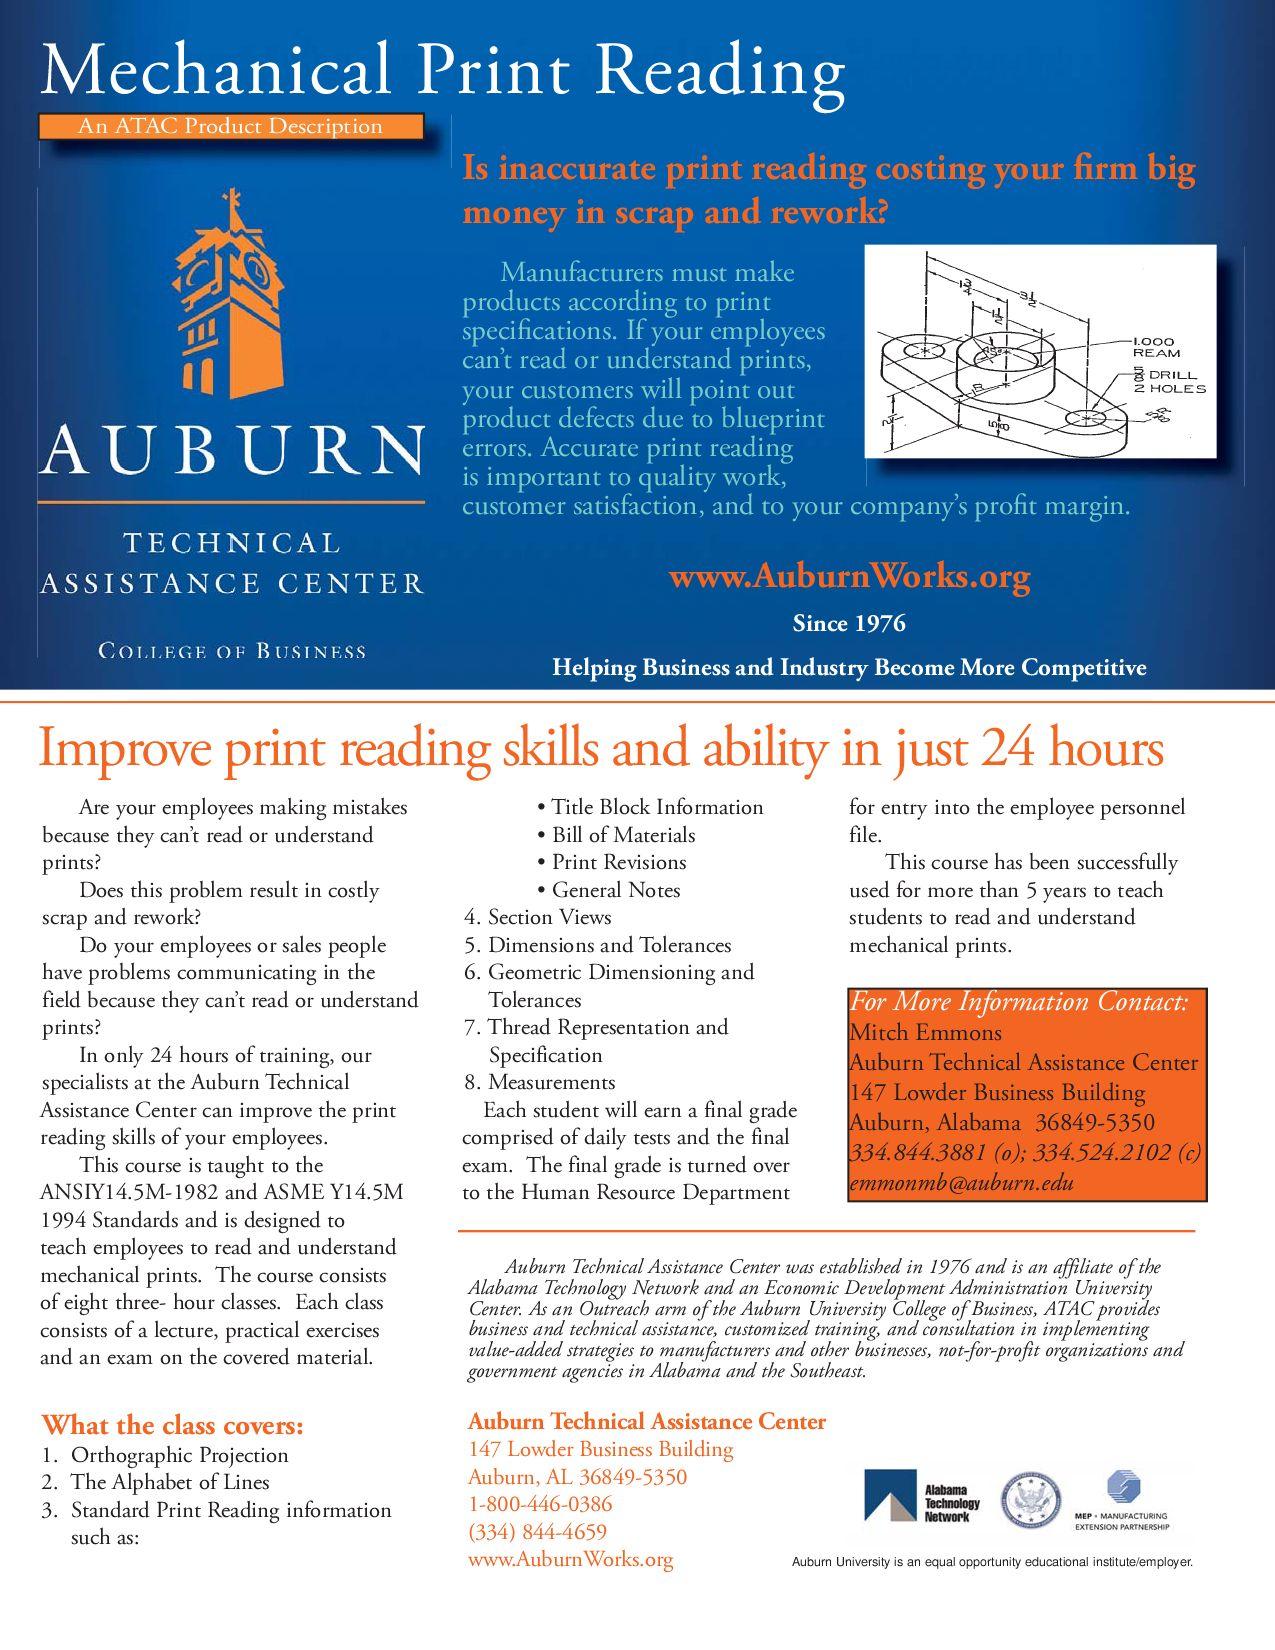 Print Reading Product Sheet By Auburn Works Auburn Technical